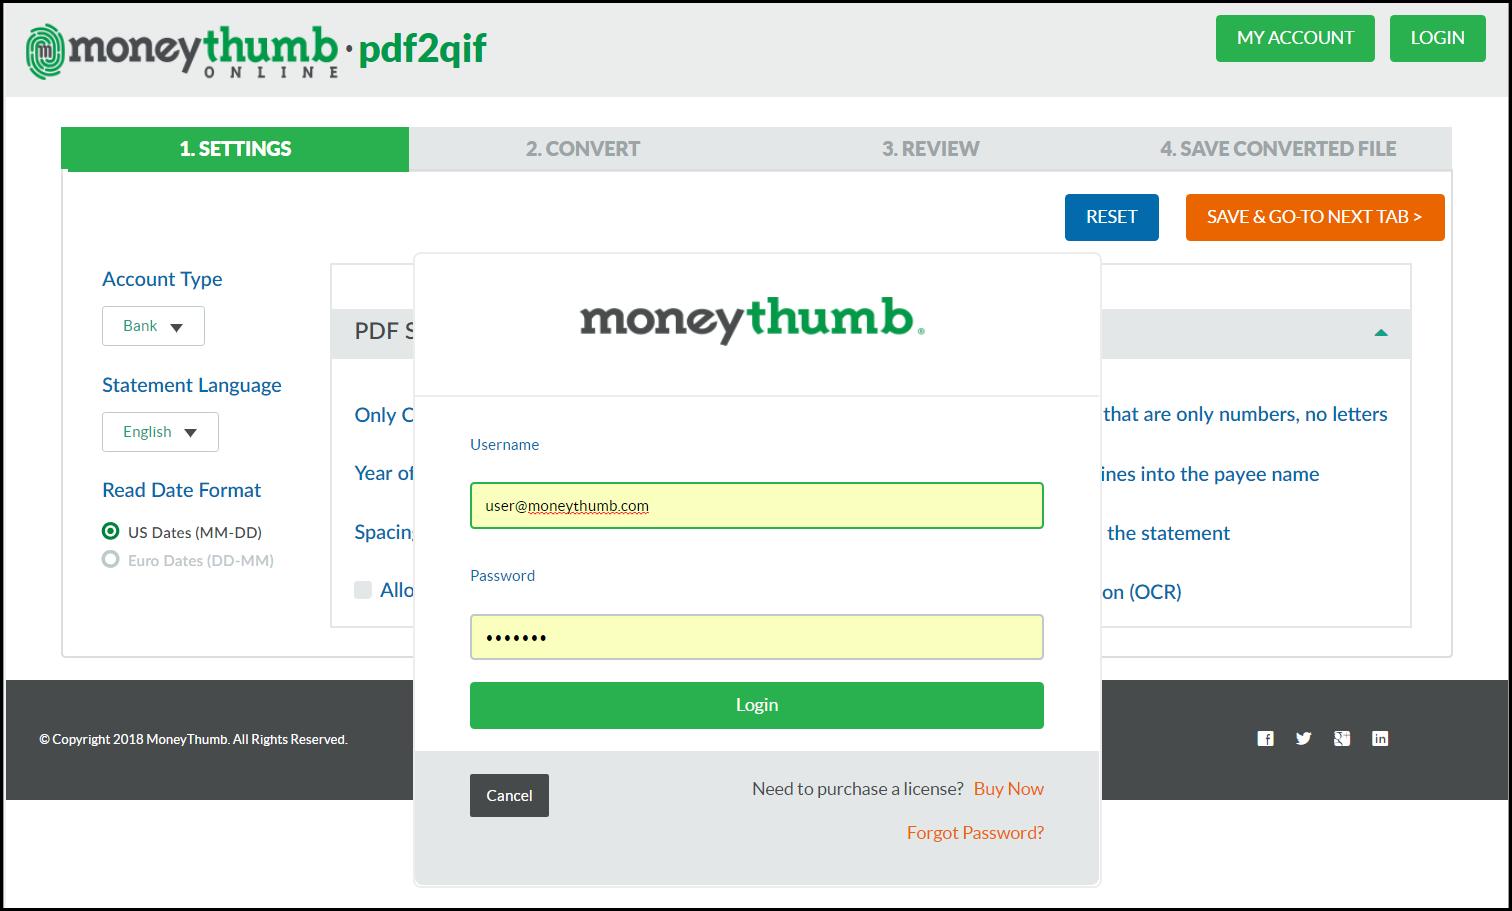 MoneyThumb Online • pdf2qif - MoneyThumb